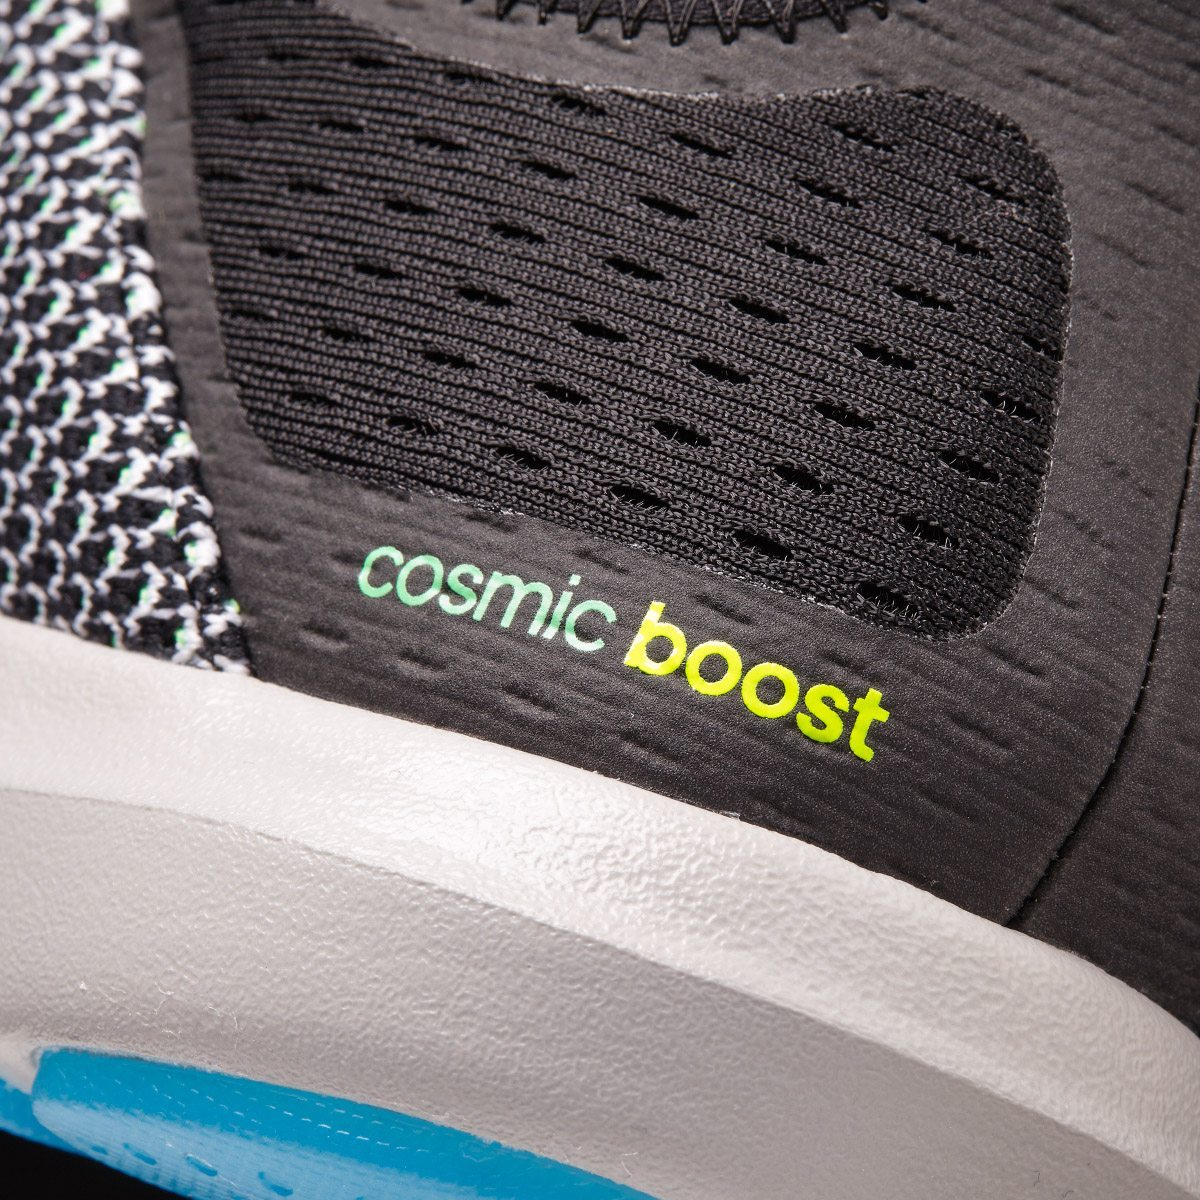 adidas Climachill Cosmic Gazelle Boost 2